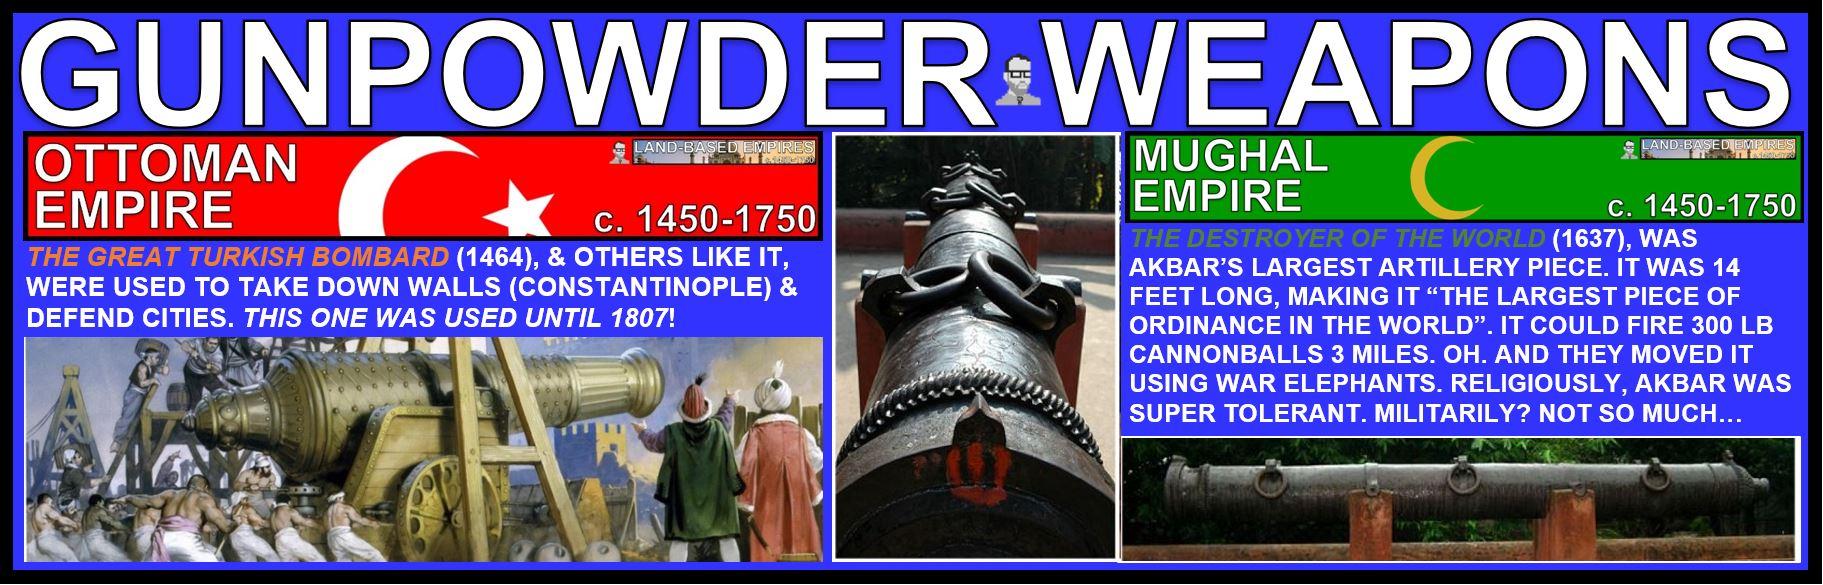 GUNPOWDER EMPIRES WEAPONS EXAMPLES FREEMANPEDIA AP WORLD HISTORY MODERN.JPG